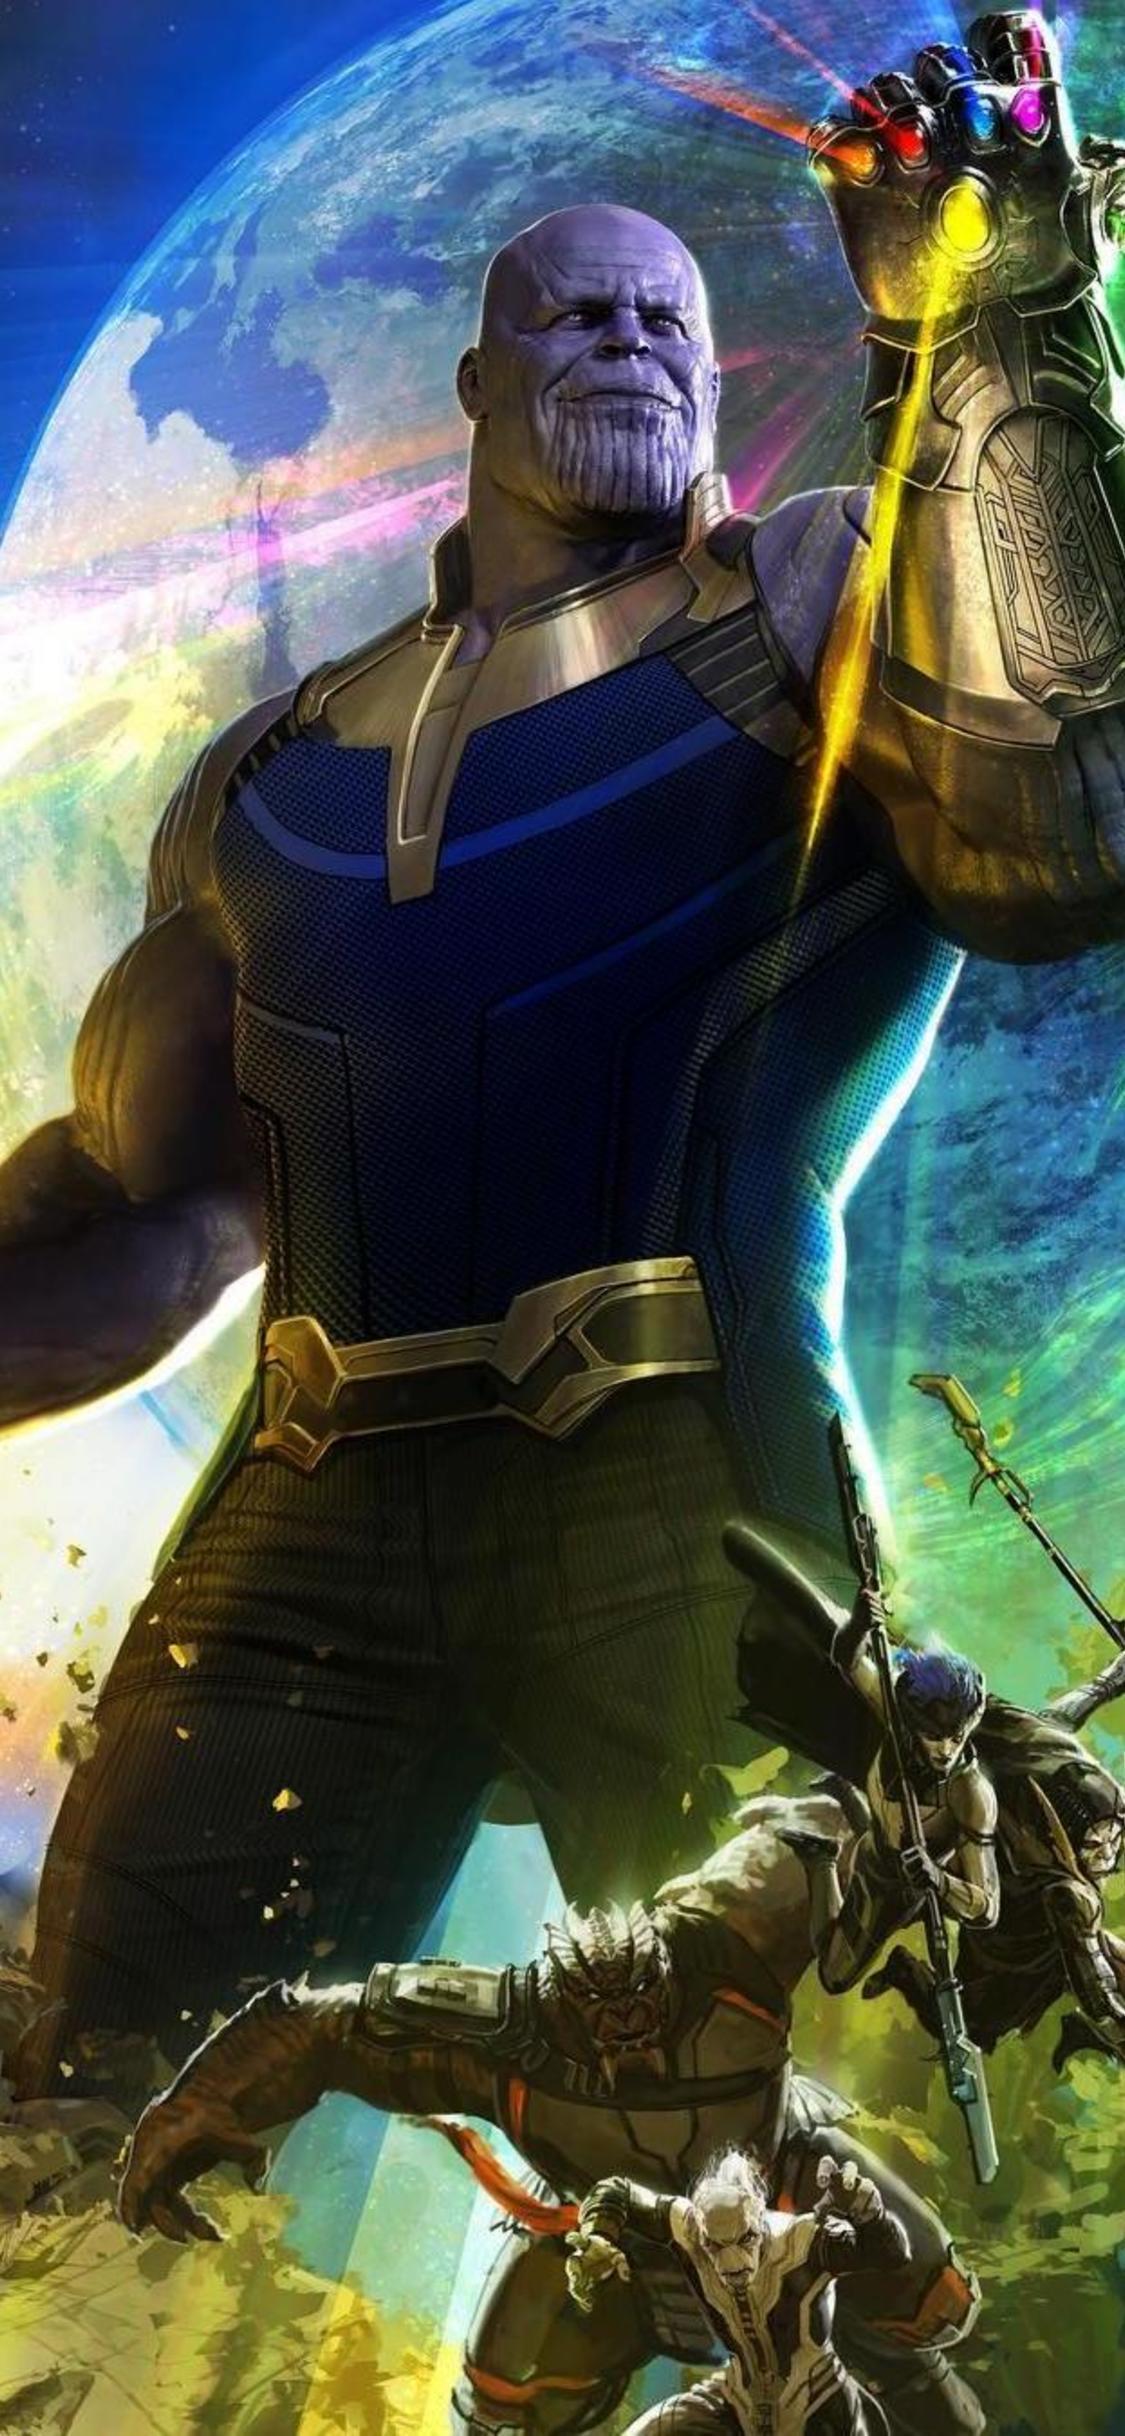 Avengers Infinity War 2018 4k Iphone X